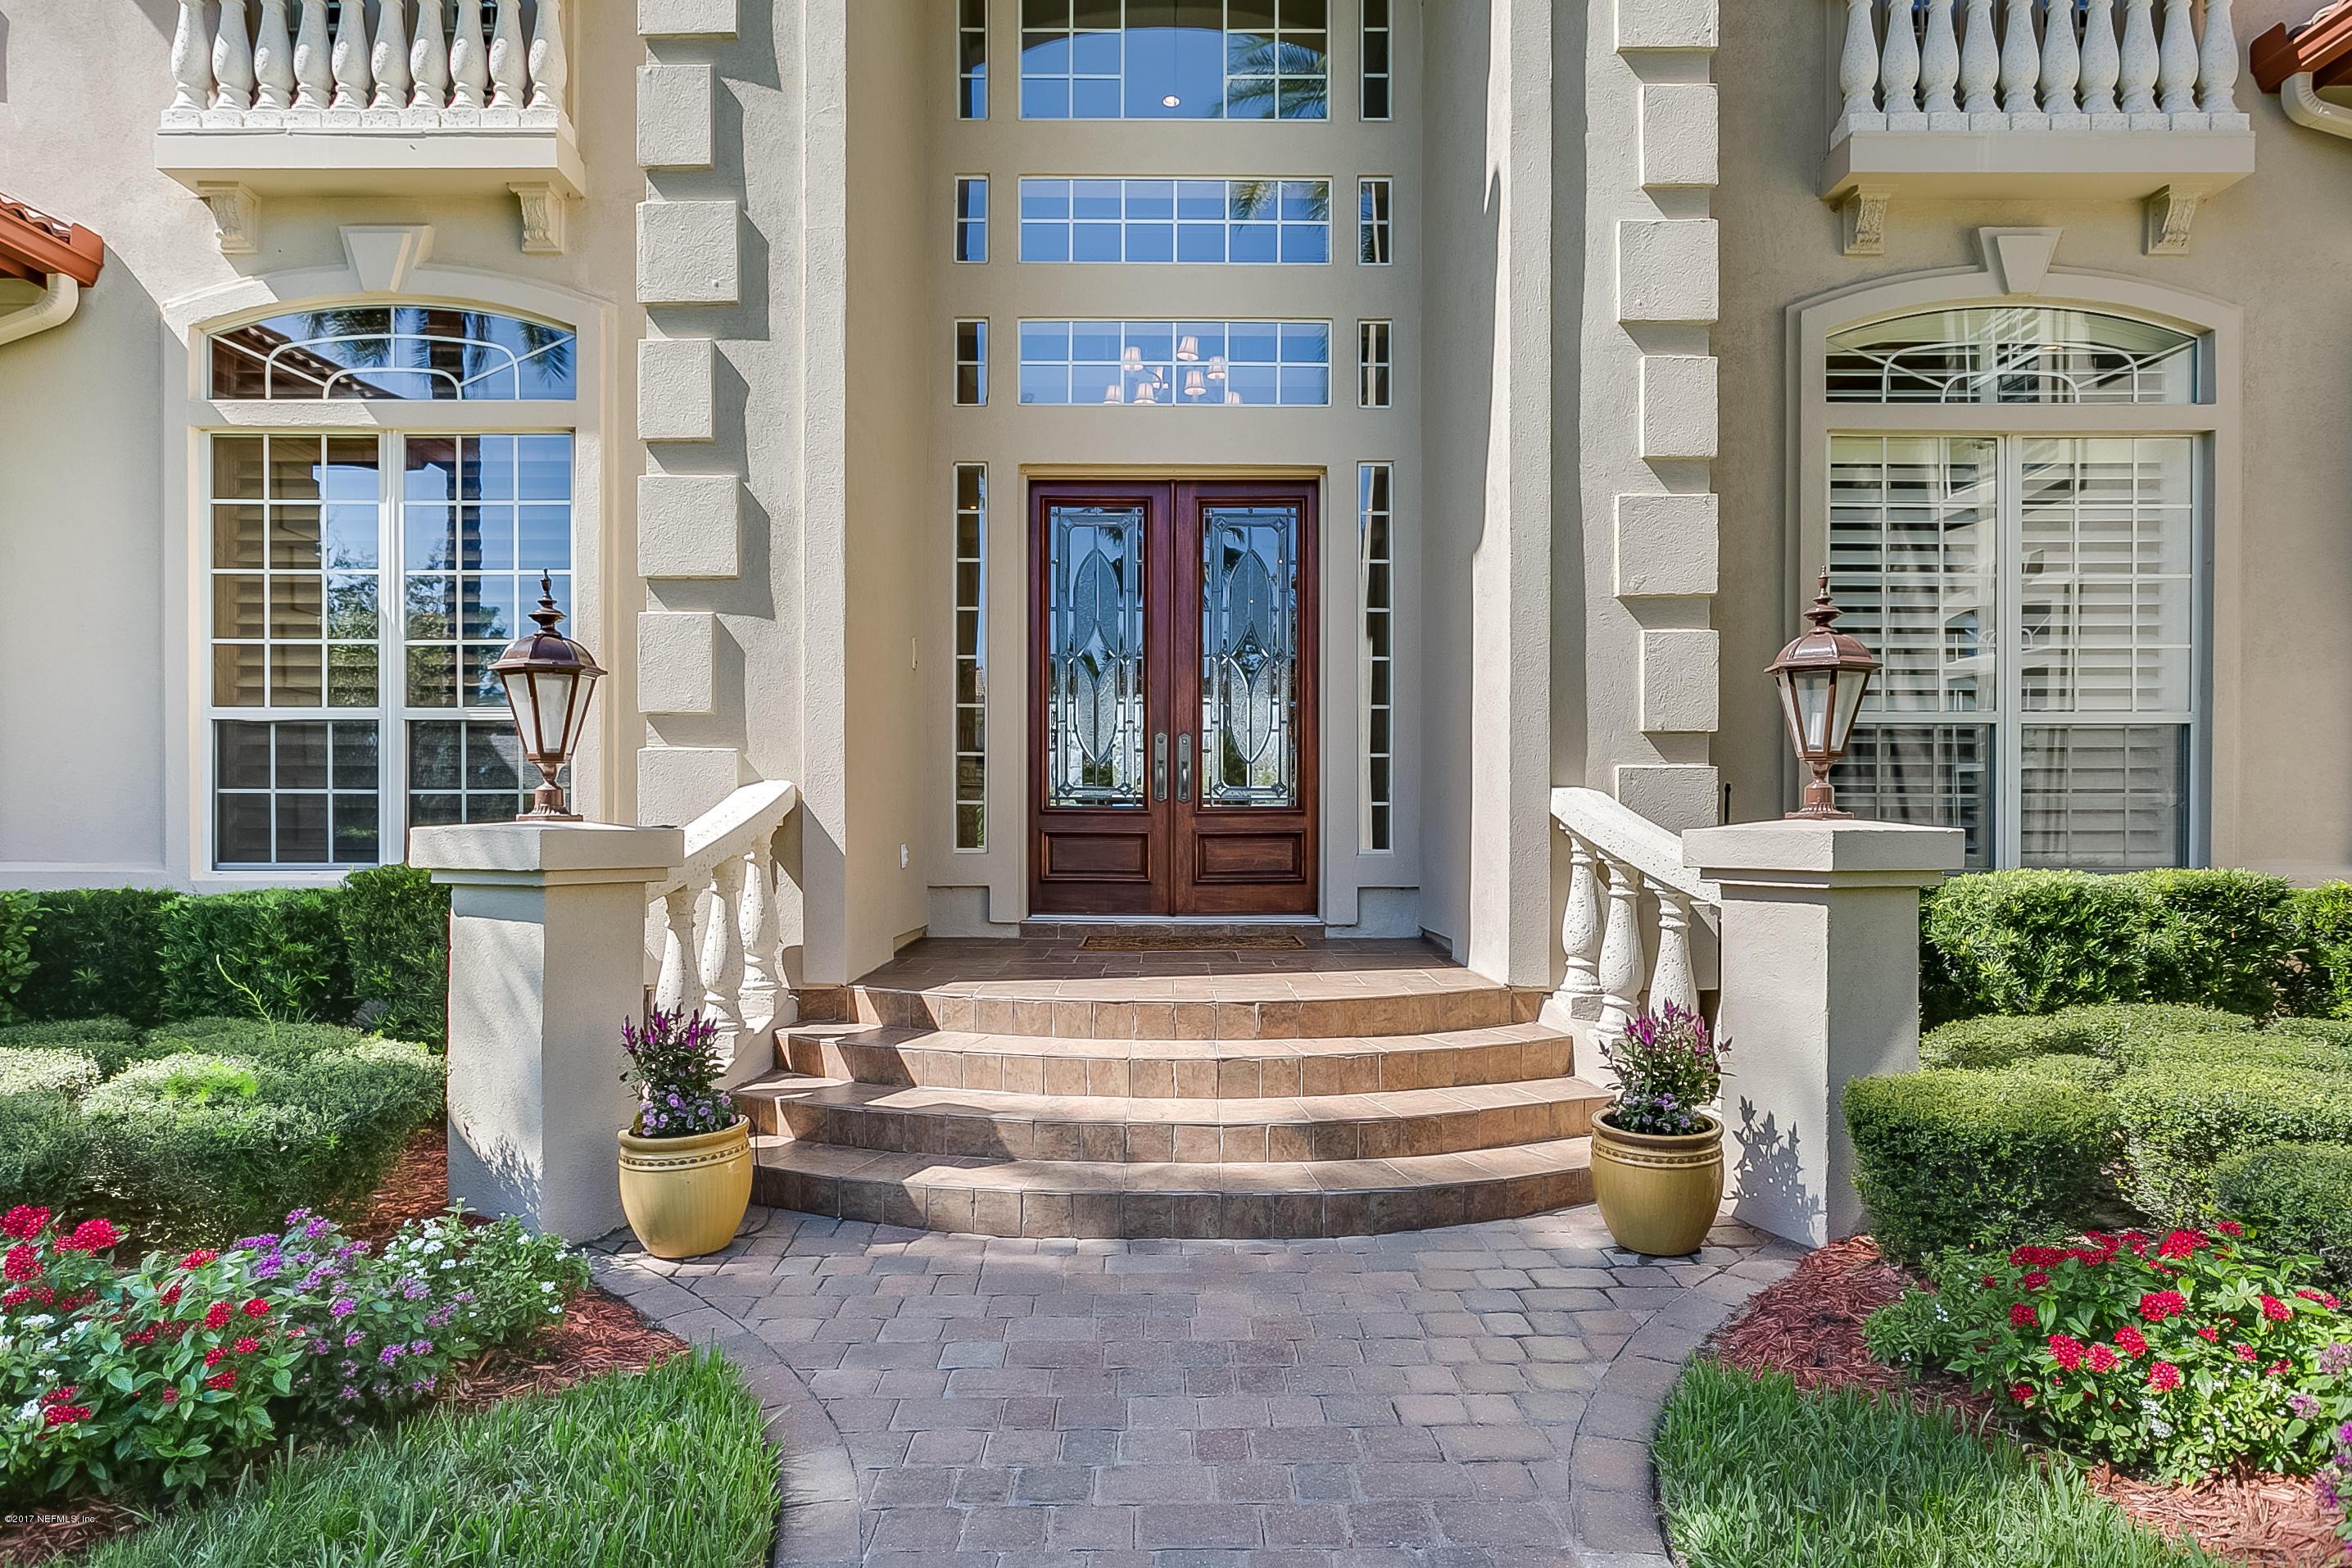 370 ROYAL TERN, PONTE VEDRA BEACH, FLORIDA 32082, 6 Bedrooms Bedrooms, ,6 BathroomsBathrooms,Residential - single family,For sale,ROYAL TERN,905638